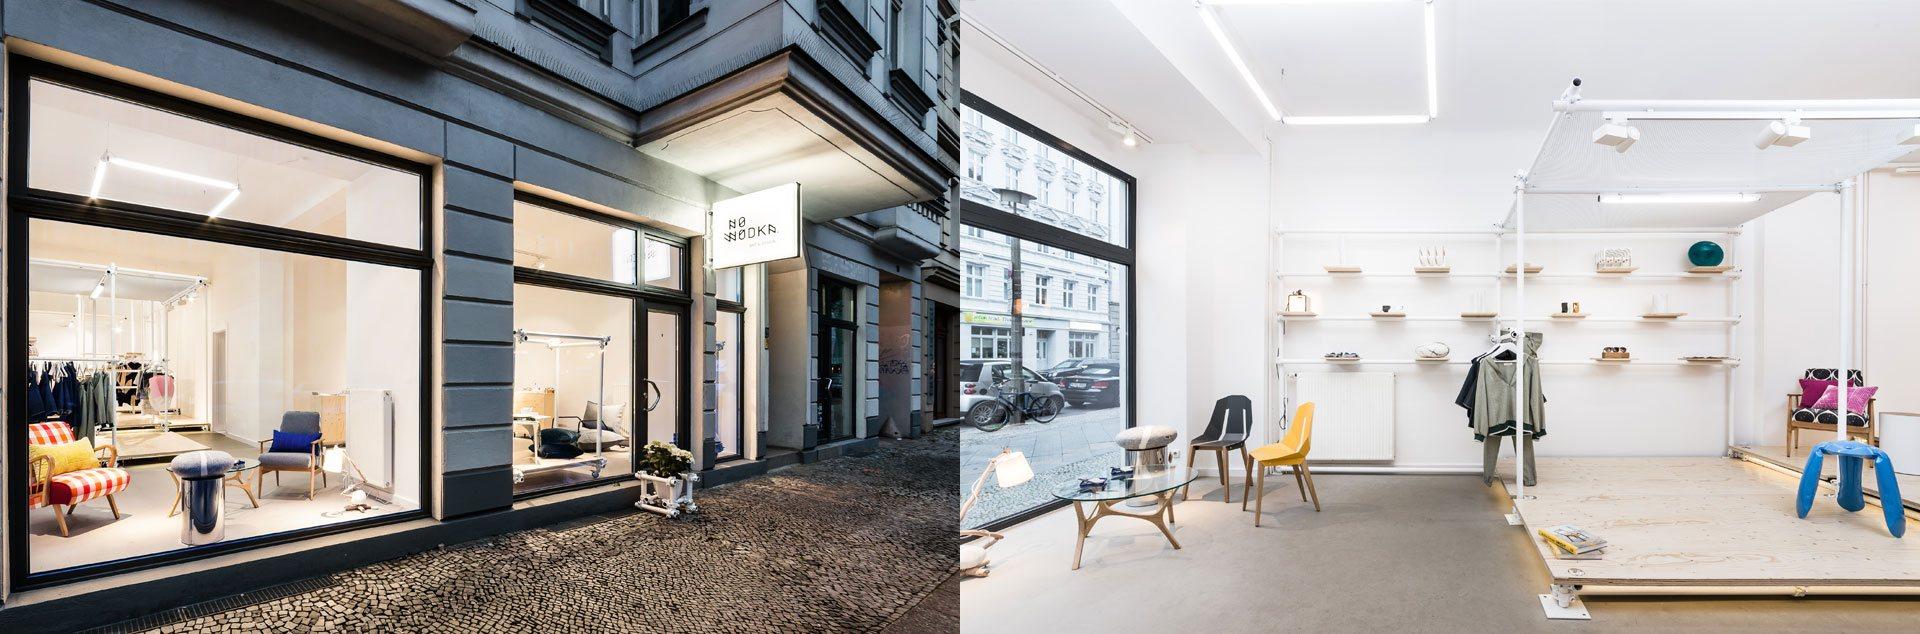 no wÓdka - concept store / polnisches design laden in berlin